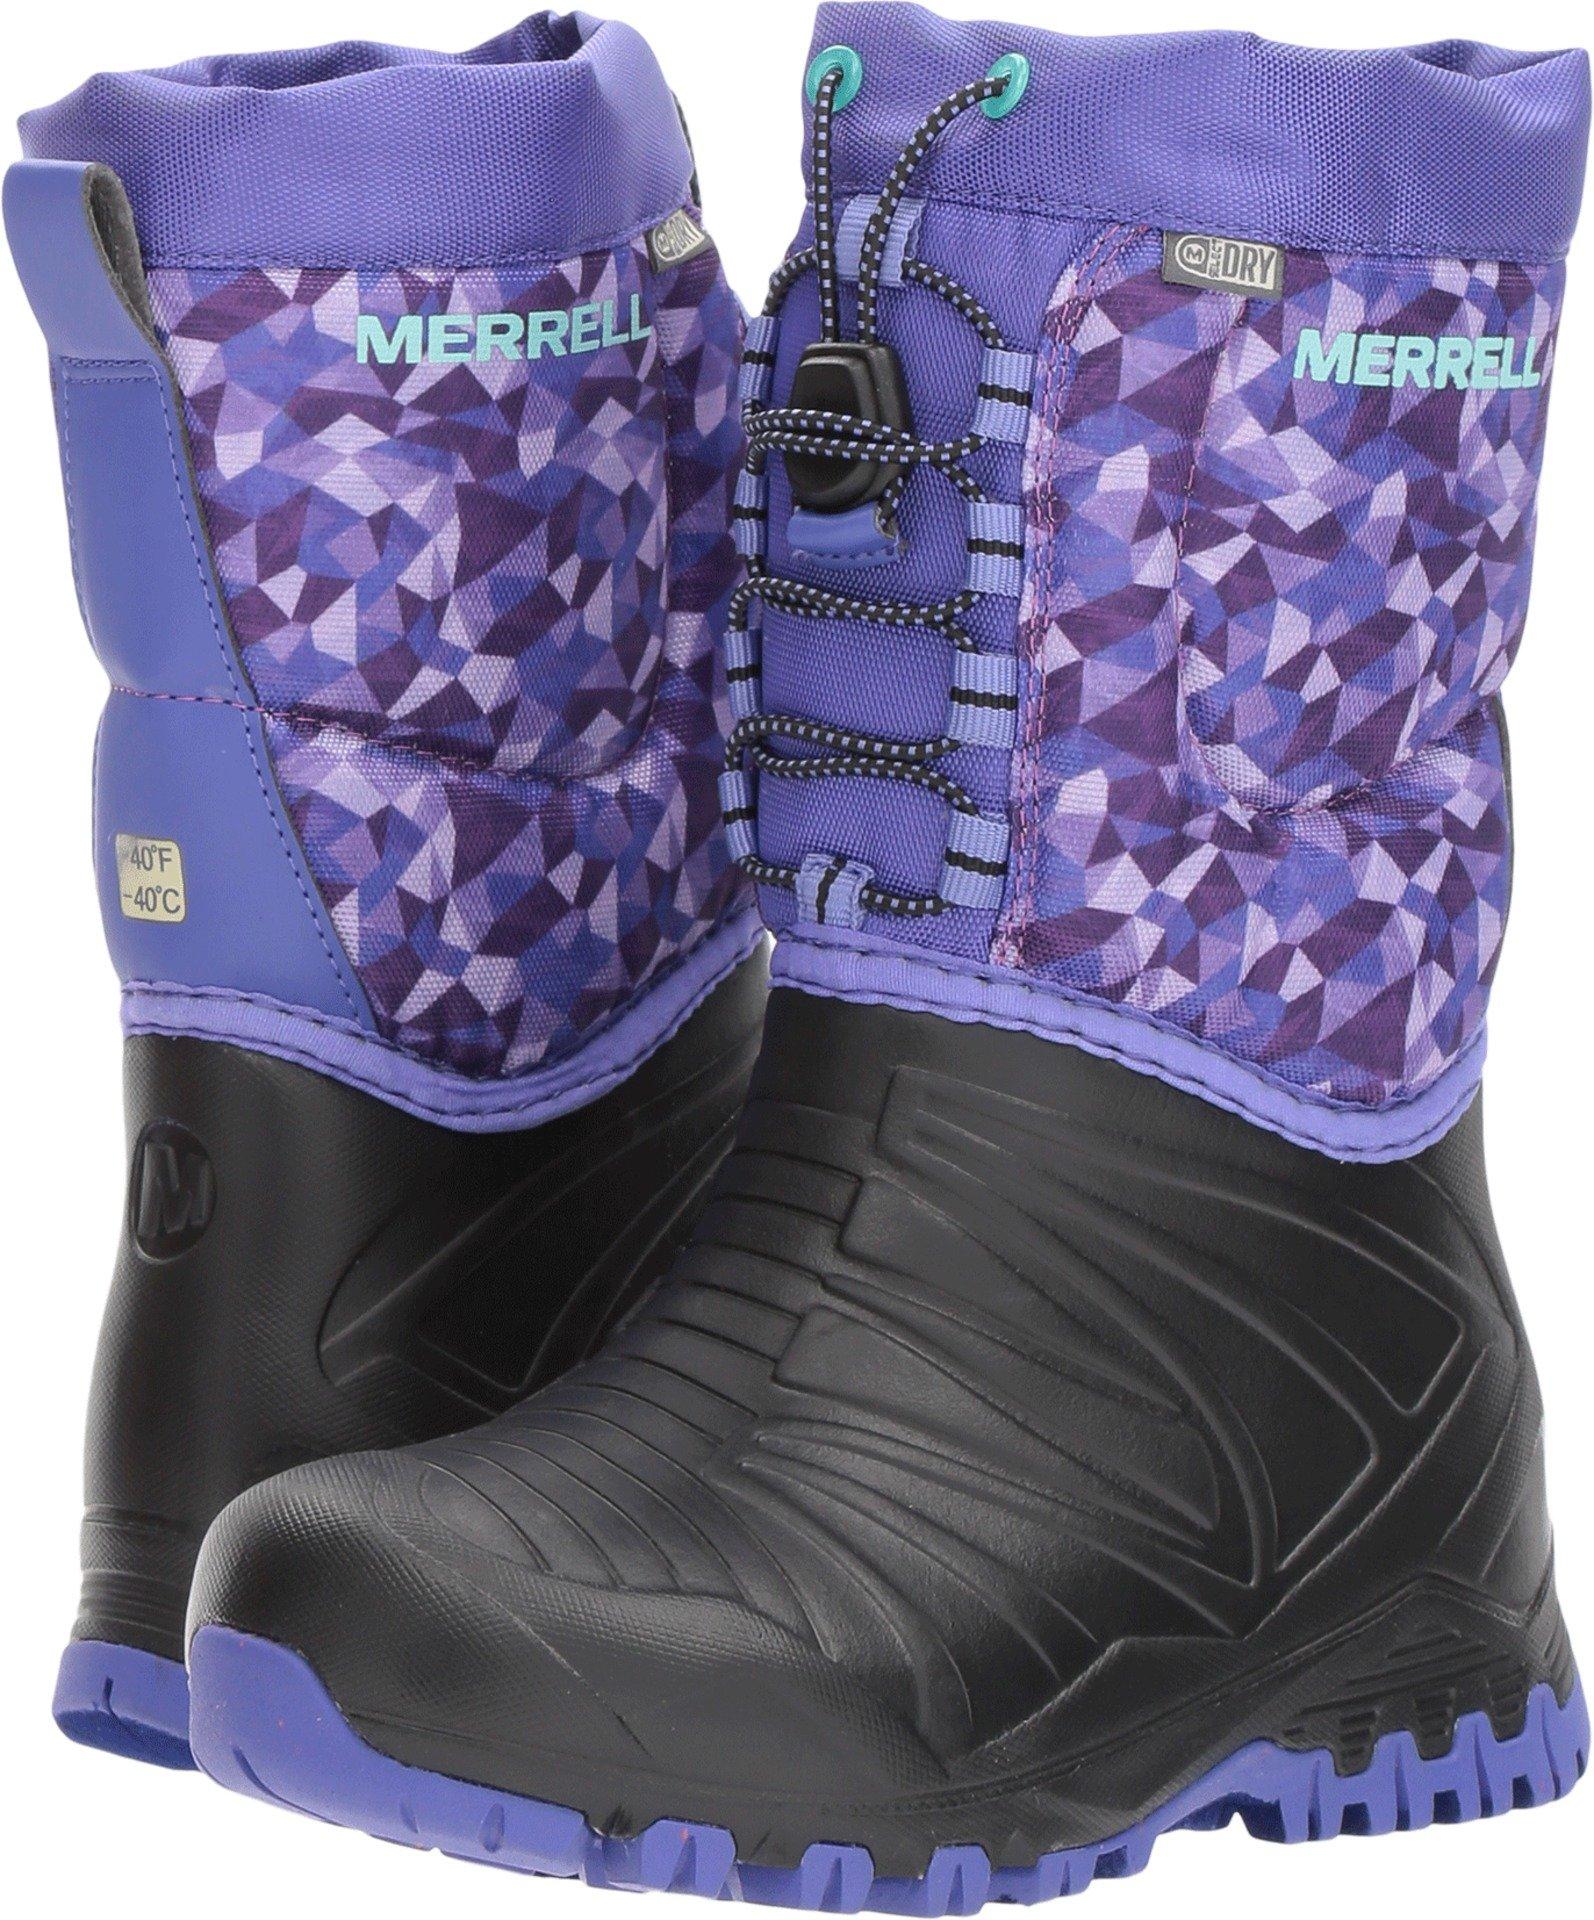 Merrell Snow Quest Lite Waterproof Snow Boot (Little Kid/Big Kid), Black/Purple, 12 M US Little Kid